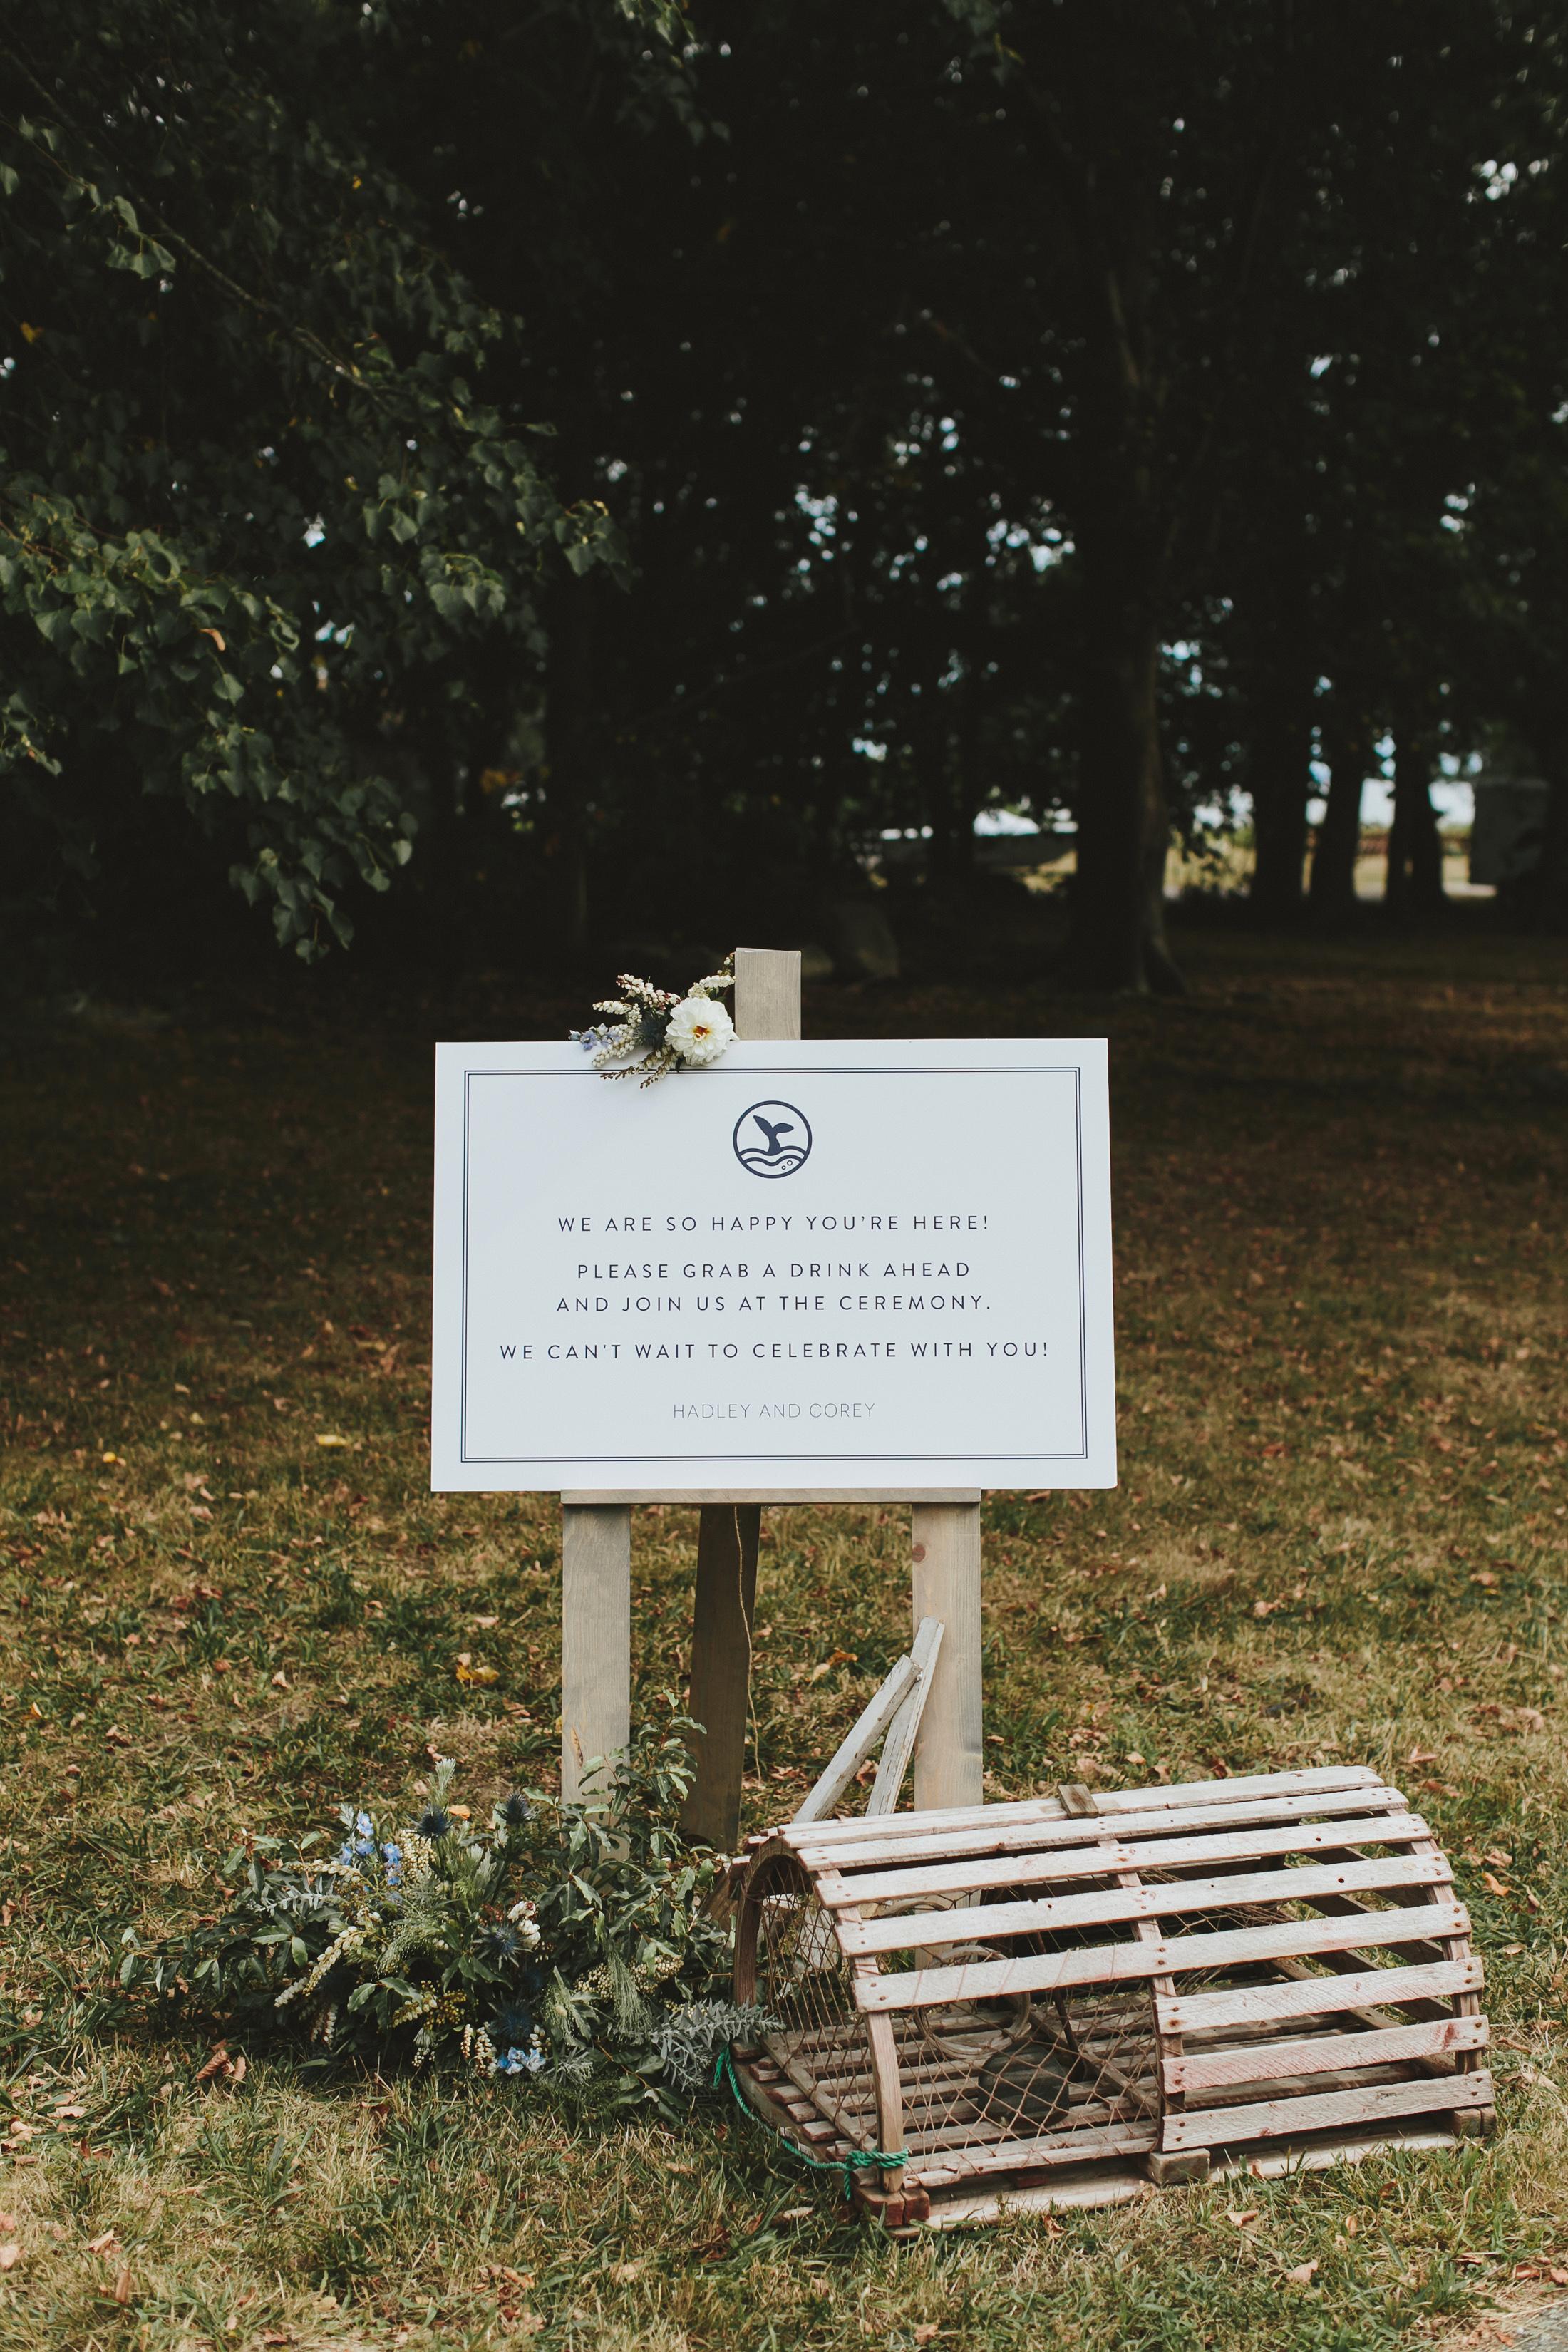 hadley corey wedding sign